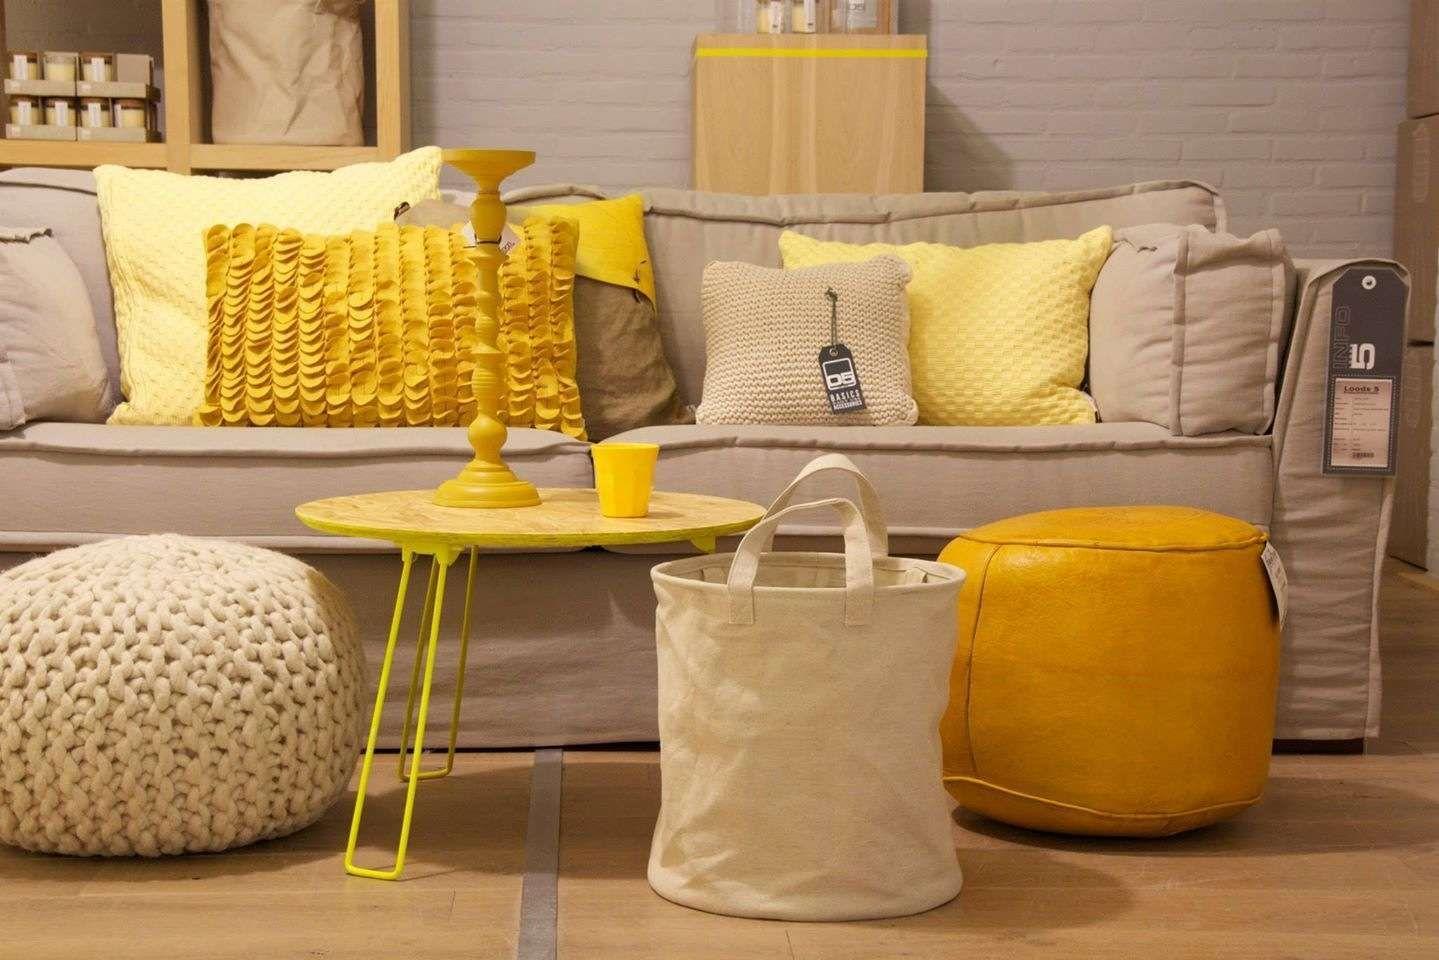 Accessoires Voor Woonkamer : Grote gele accessoires woonkamer google search ideeën voor het